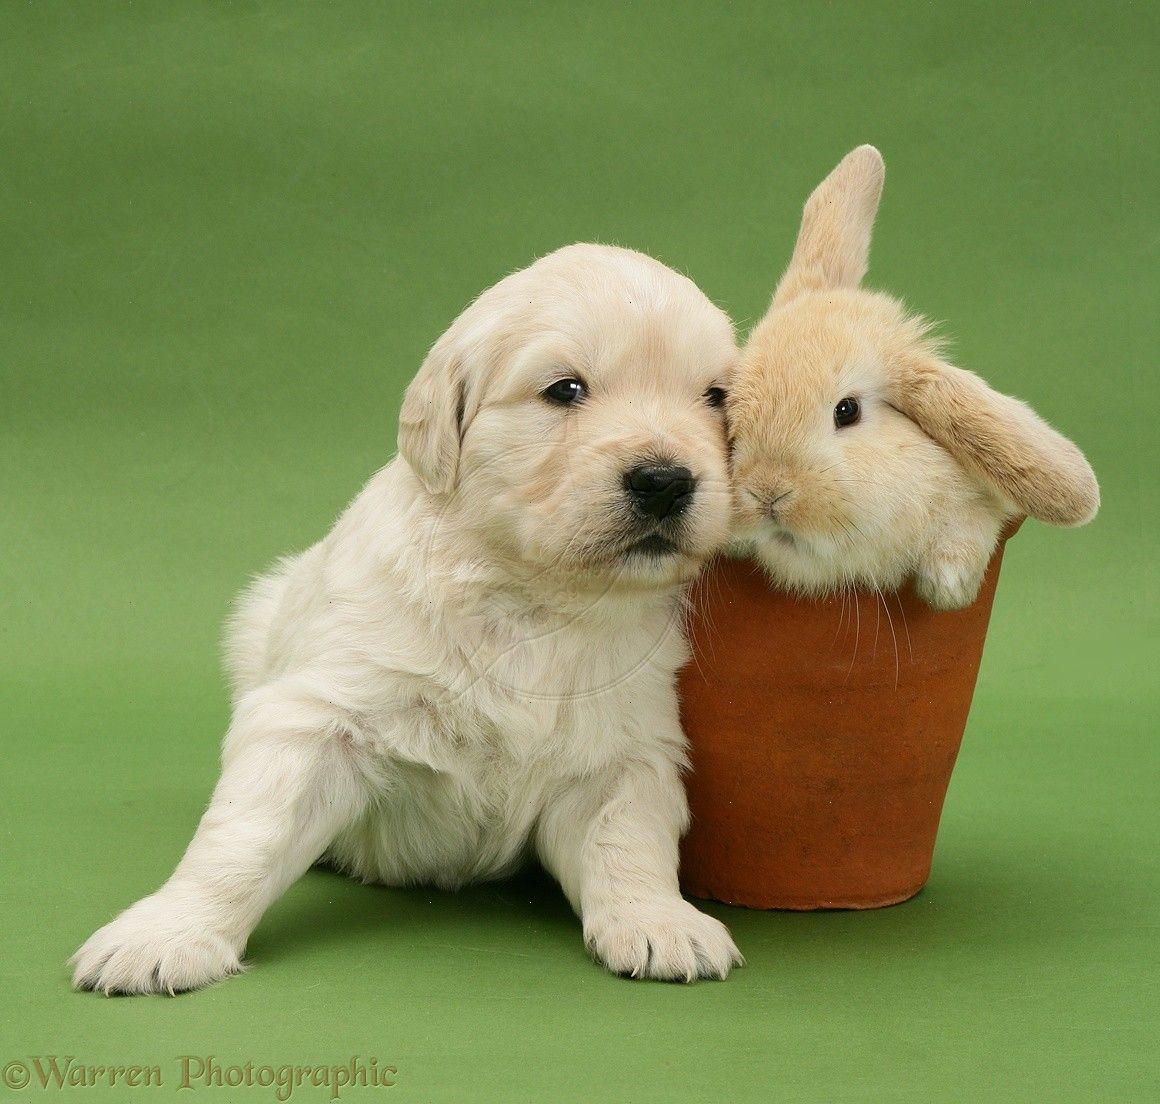 puppies & bunnies | Cute Retriever puppy with bunny rabbit ...